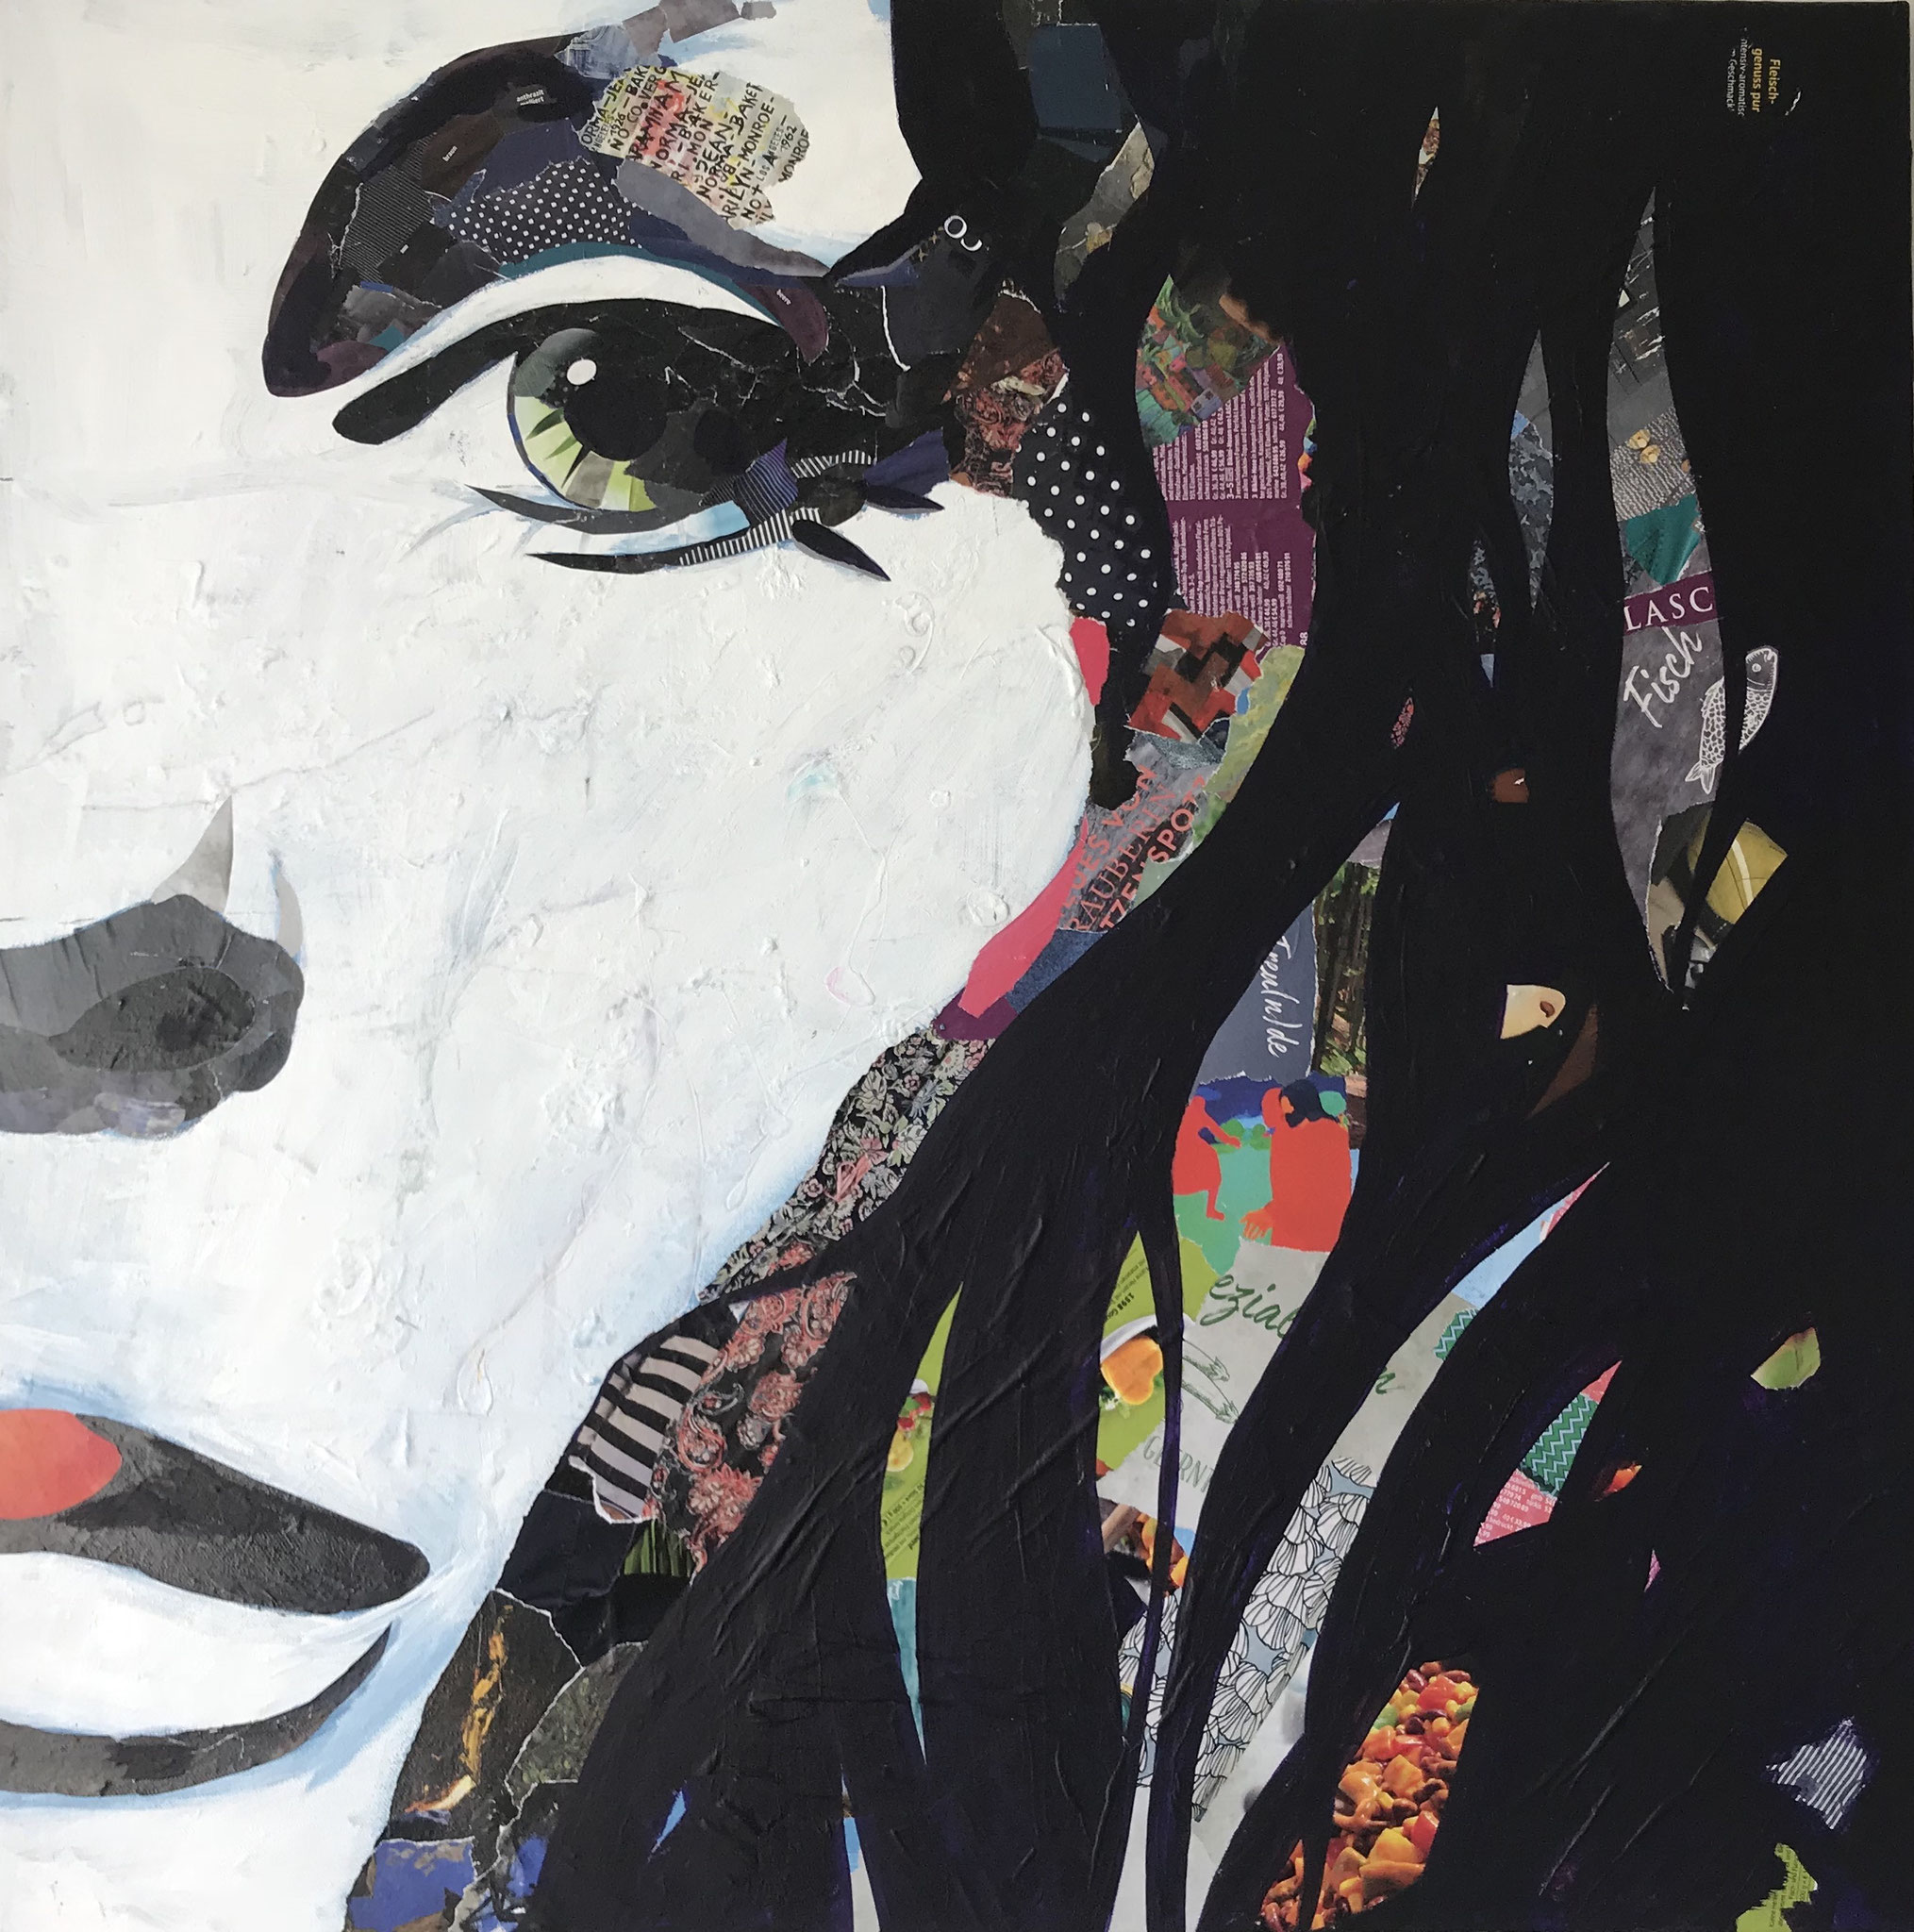 Calypso, Collage Acryl und Papier auf Leinwand, 80 x 80 cm